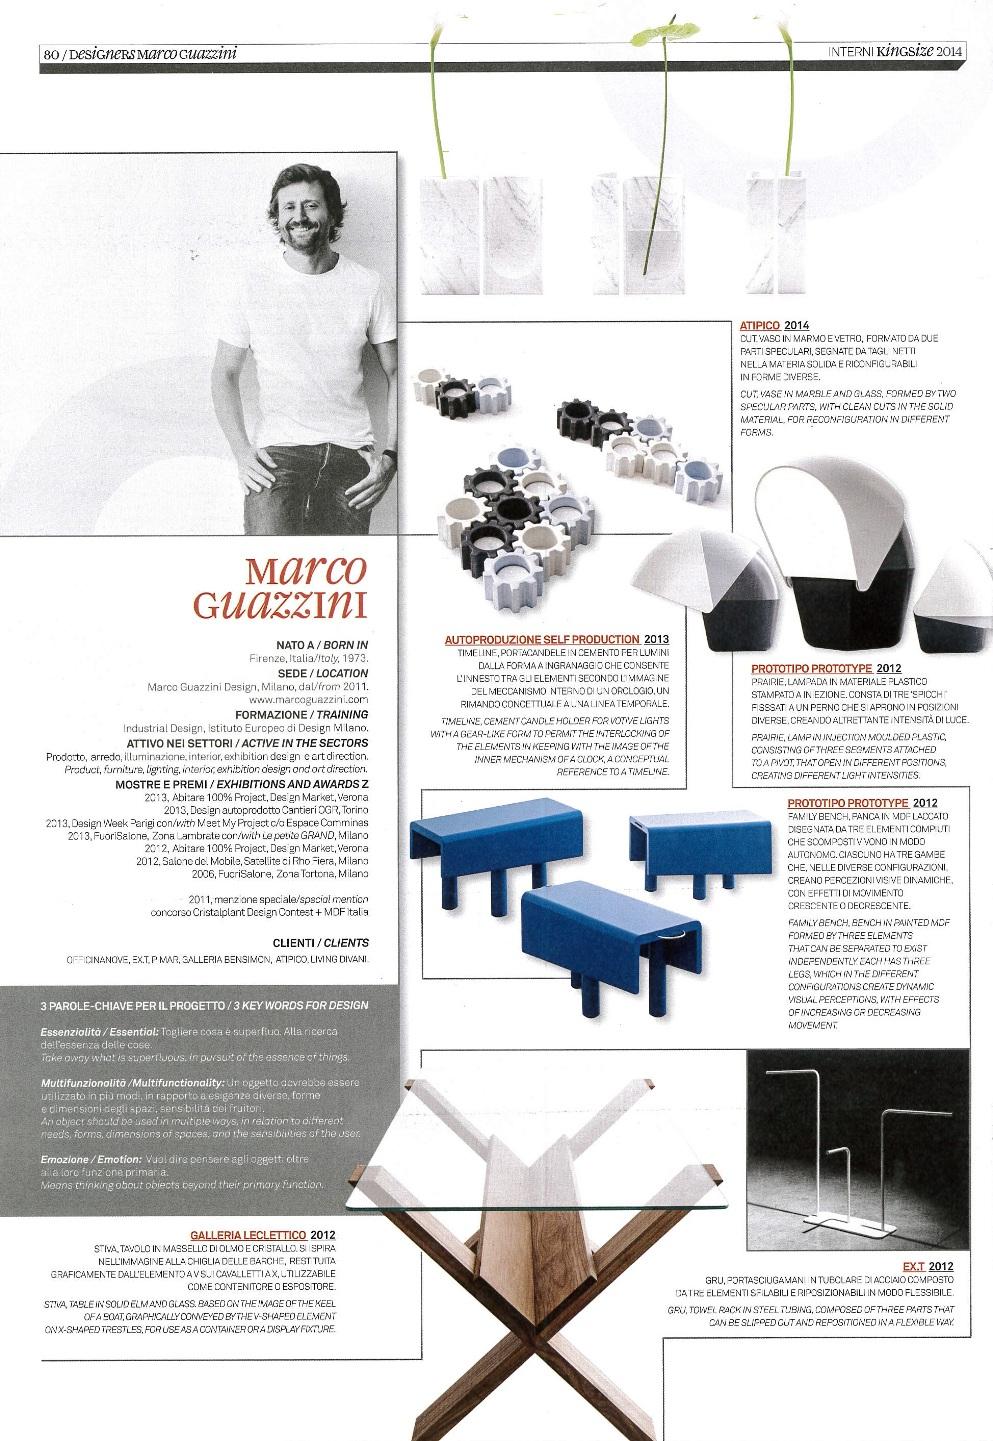 dedece interni young designers salone 2014 (6)